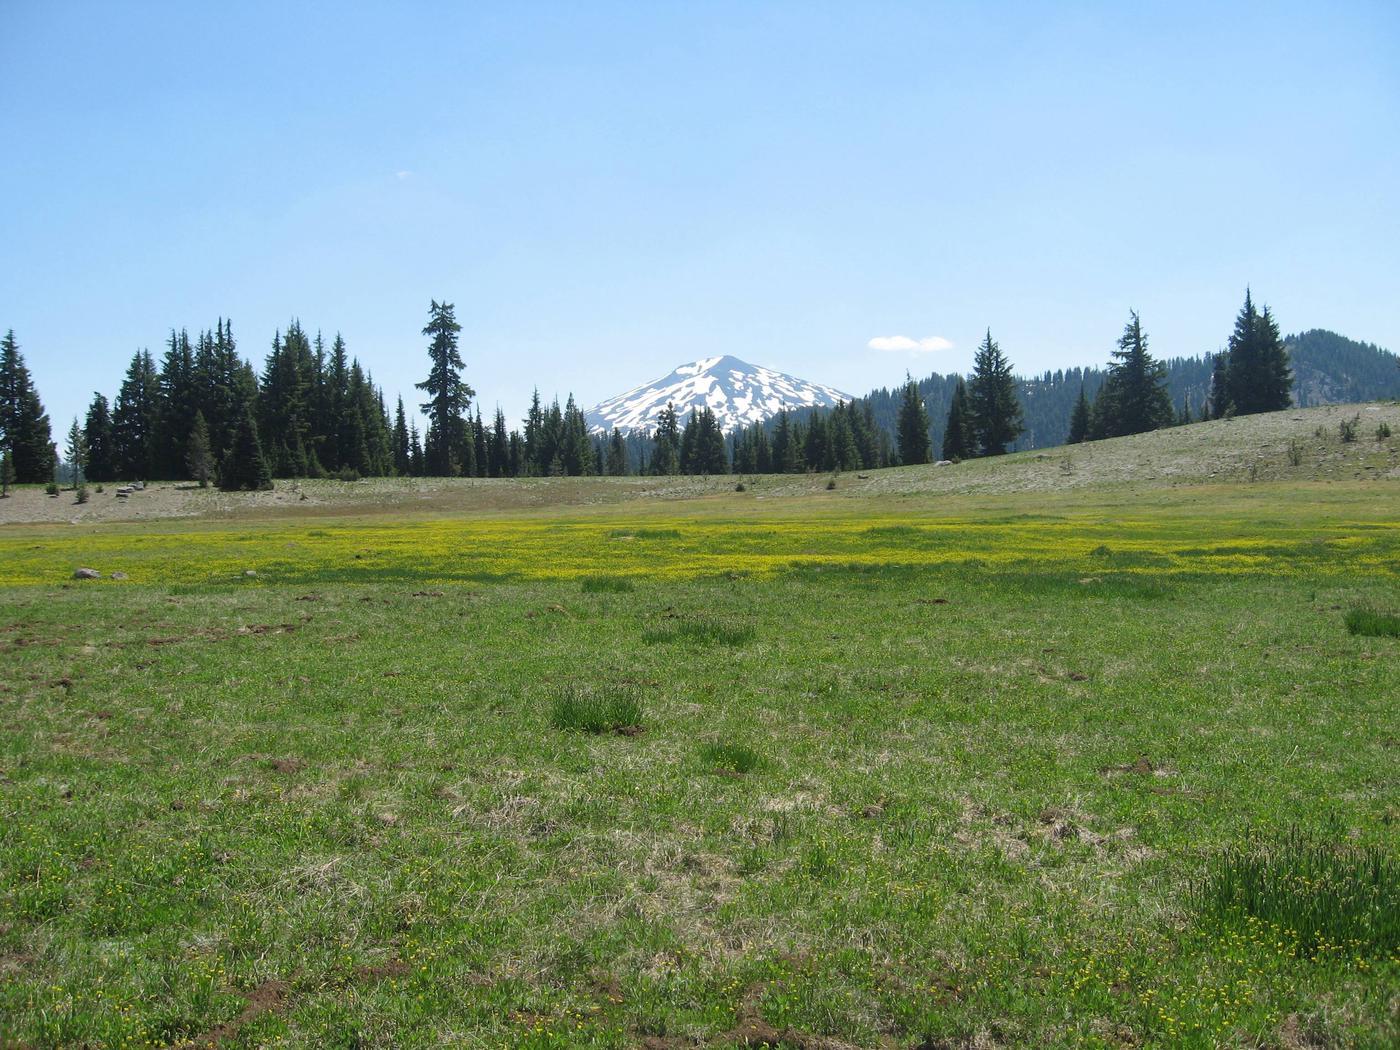 Todd Trail, Todd Lake, Three Sisters Wilderness, Soda Creek, Crater DitchTodd Lake